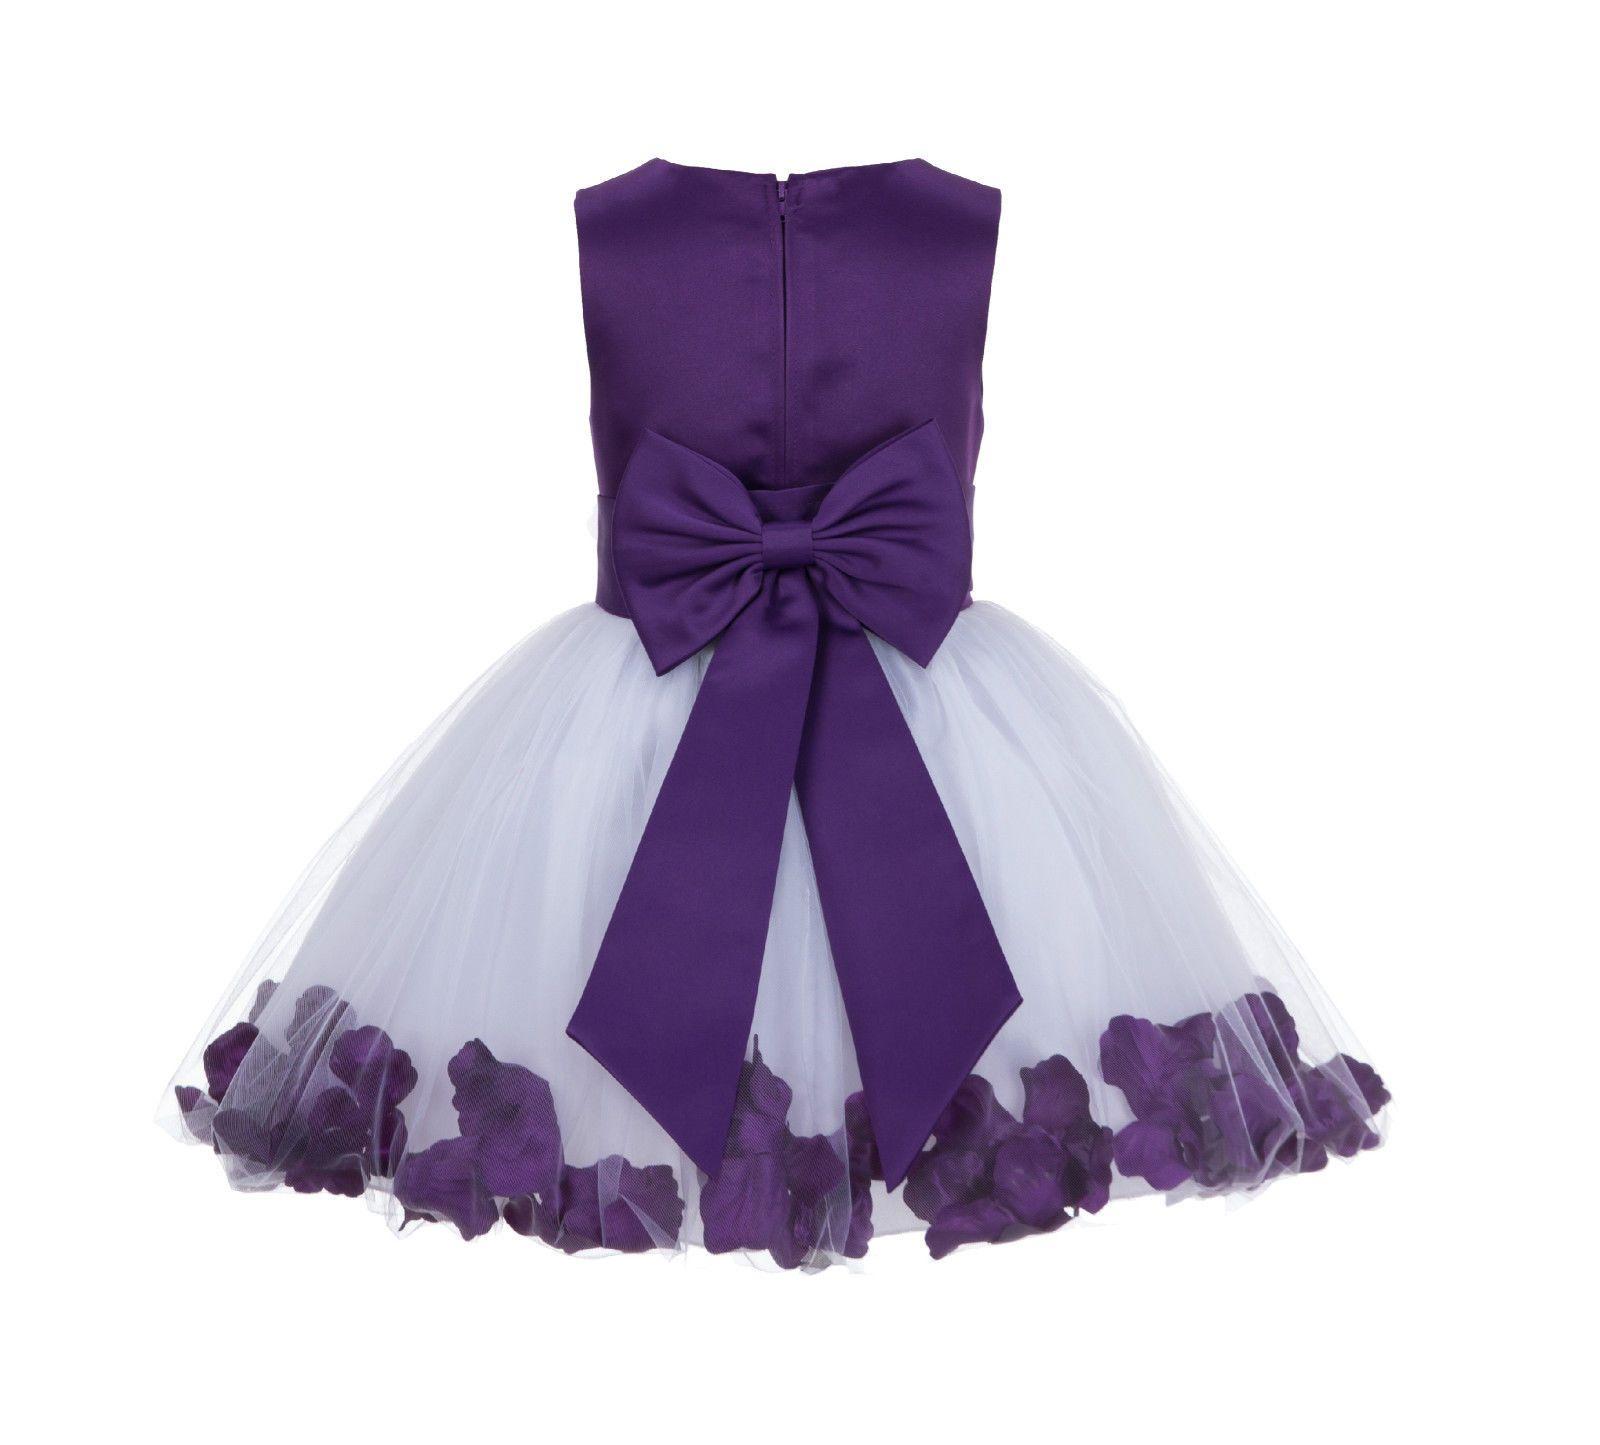 739333107654 Flower Girl Dresses Size 12 18 Months